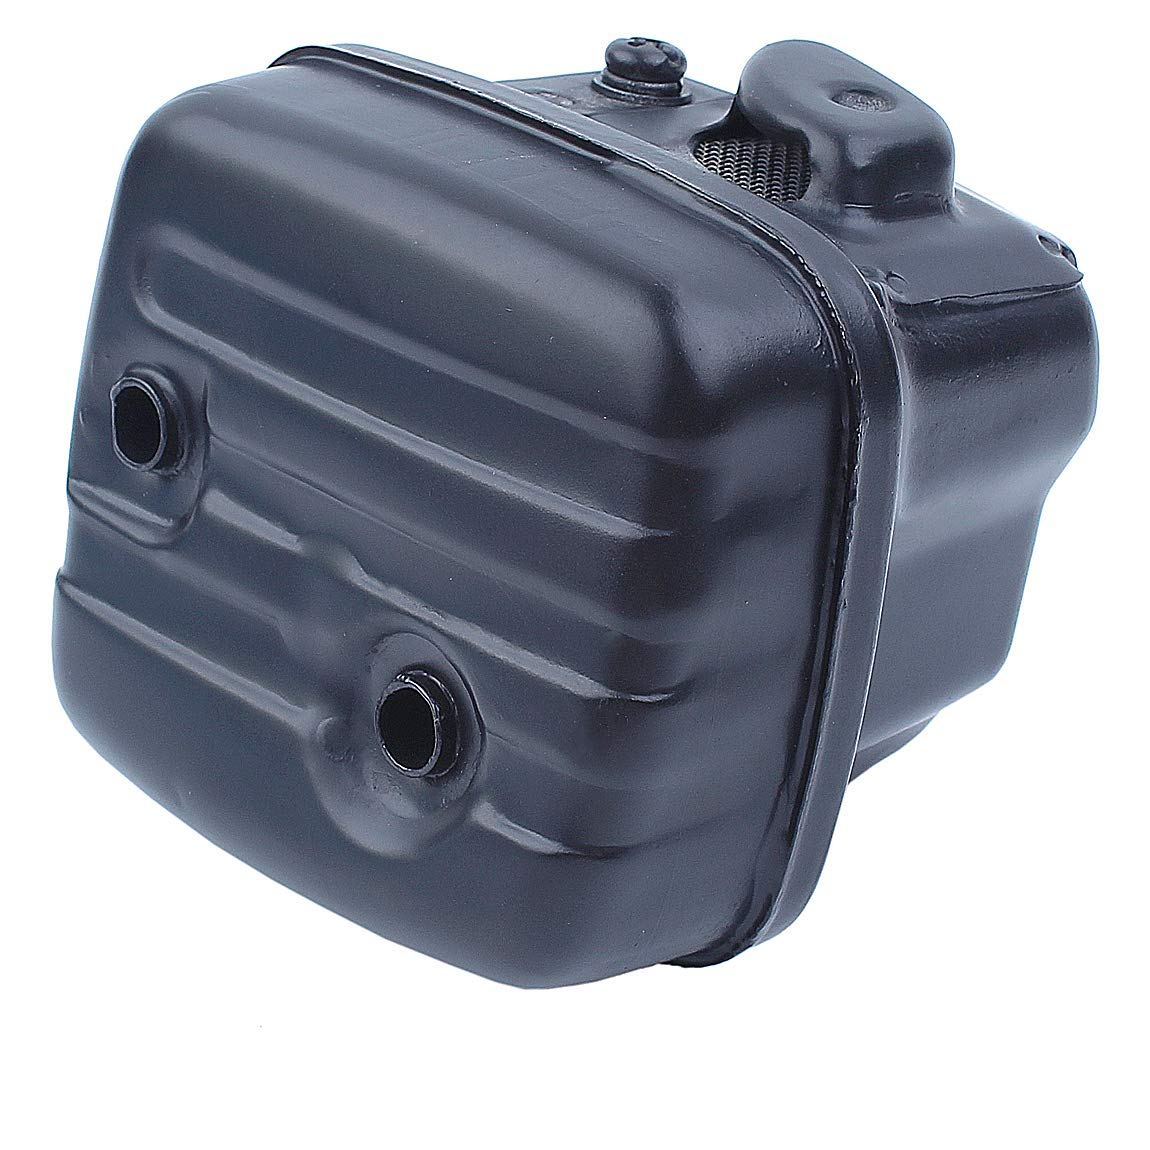 Haishine silenciador de Escape con Tornillos de Montaje del Filtro de Combustible para Husqvarna 340 345 346 346XP 350 351 353 Motosierra Jonsered 2150 2149 2152